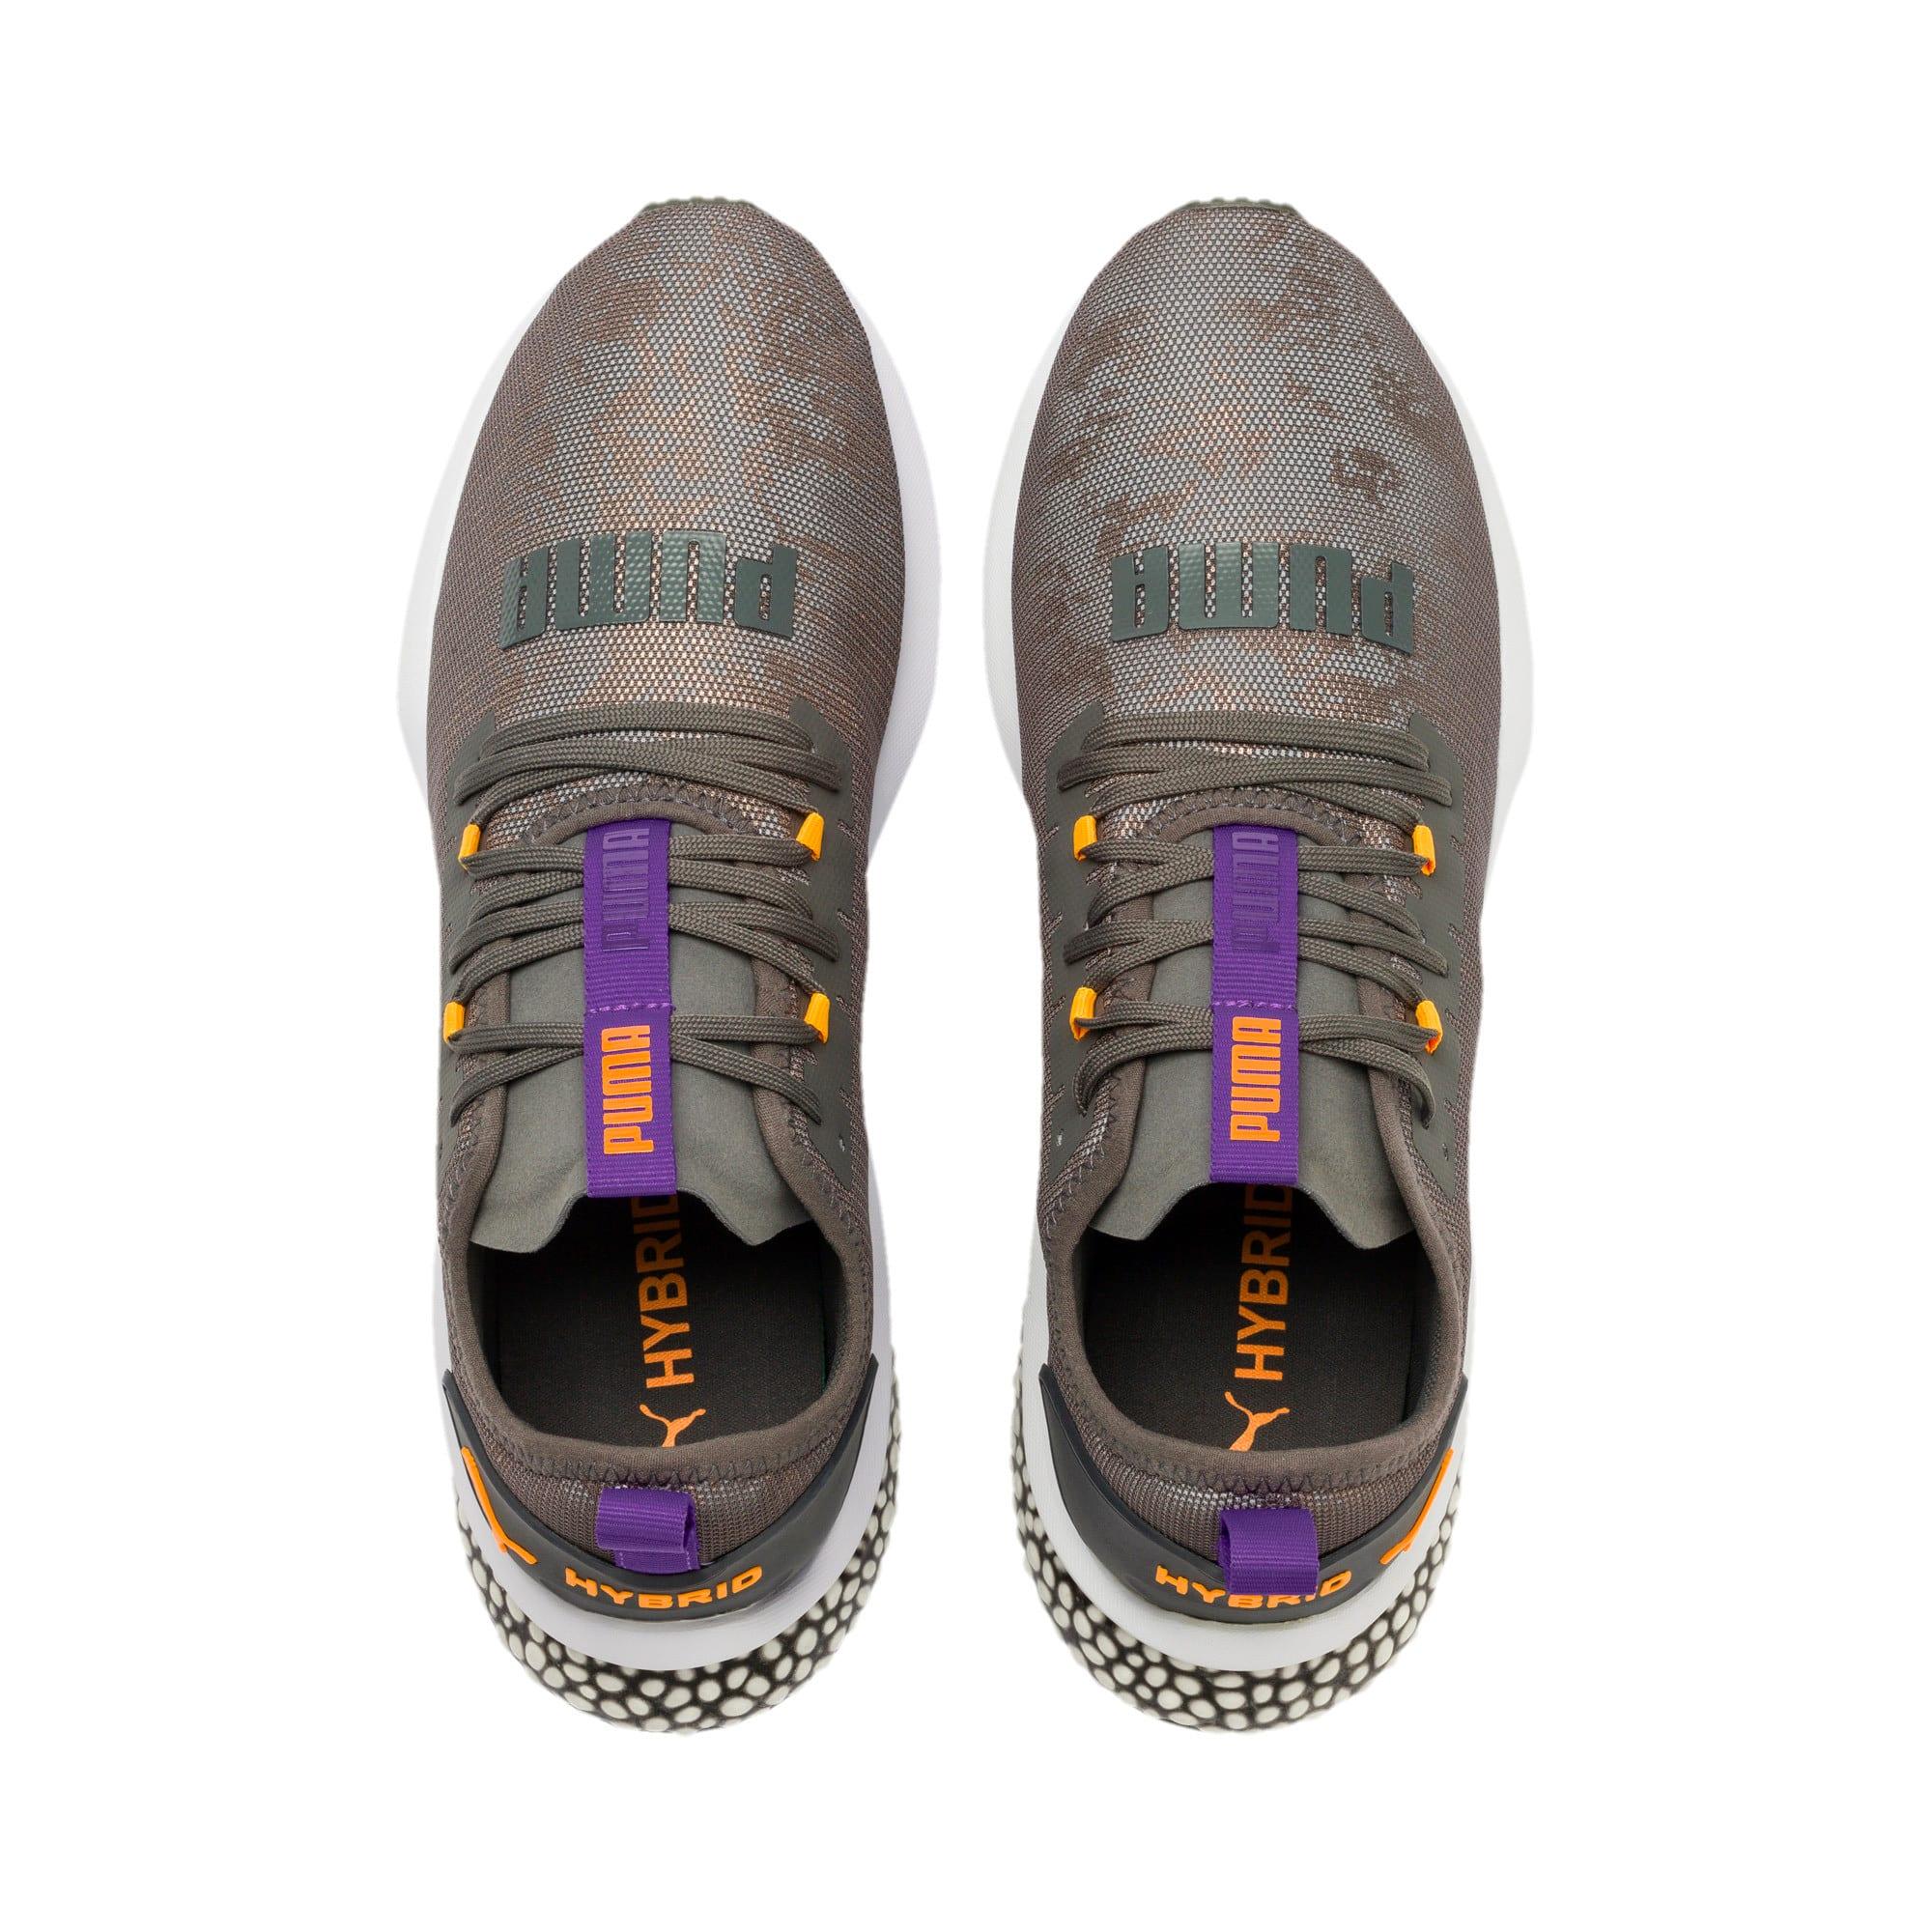 Thumbnail 7 of HYBRID NX Rave Men's Running Shoes, CASTLEROCK-Purple-Orange, medium